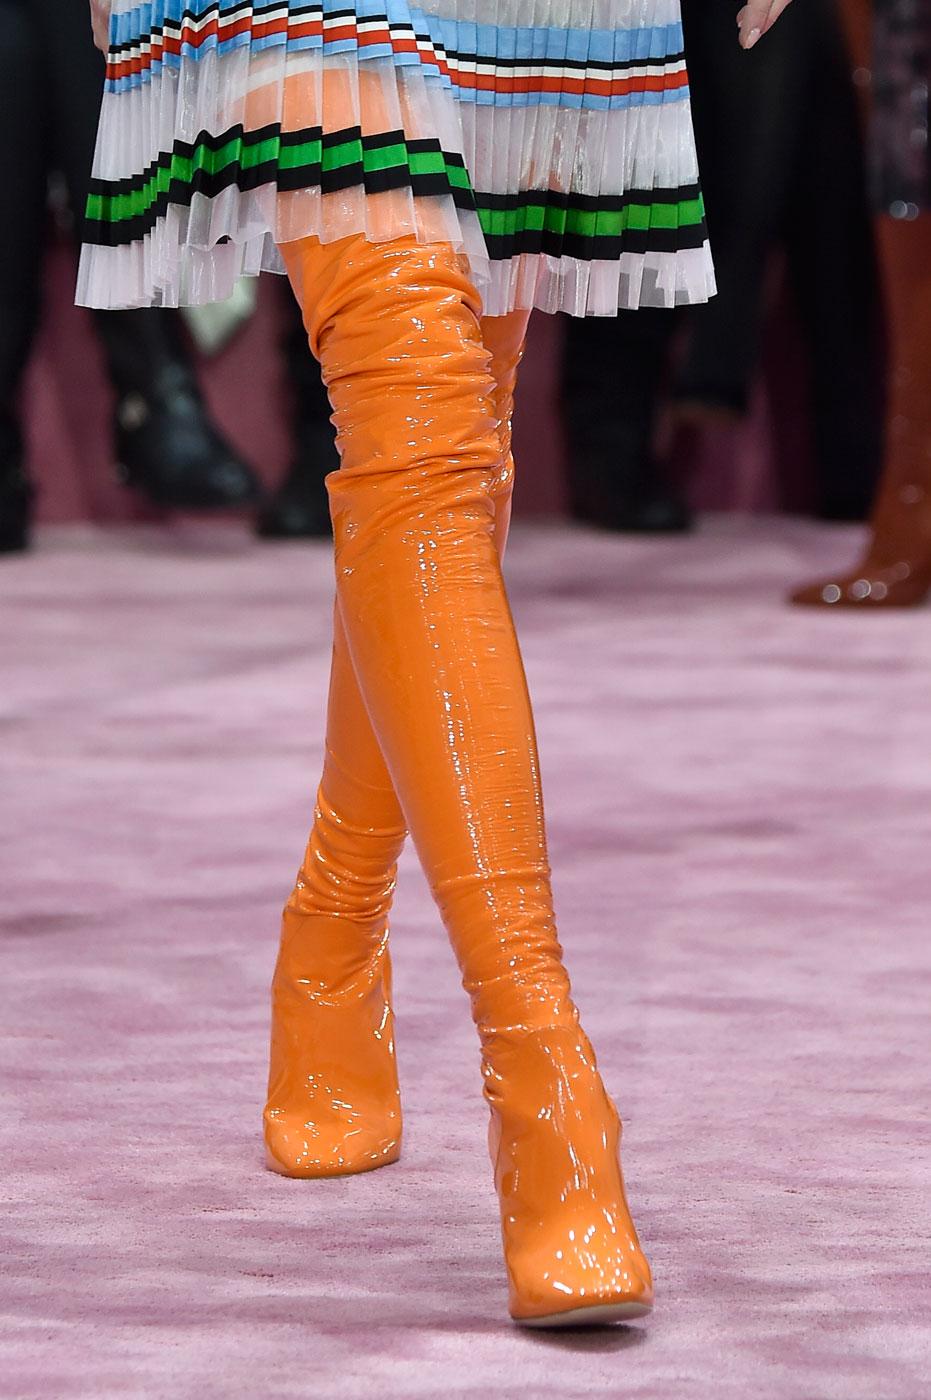 Christian-Dior-fashion-runway-show-close-ups-haute-couture-paris-spring-summer-2015-the-impression-009